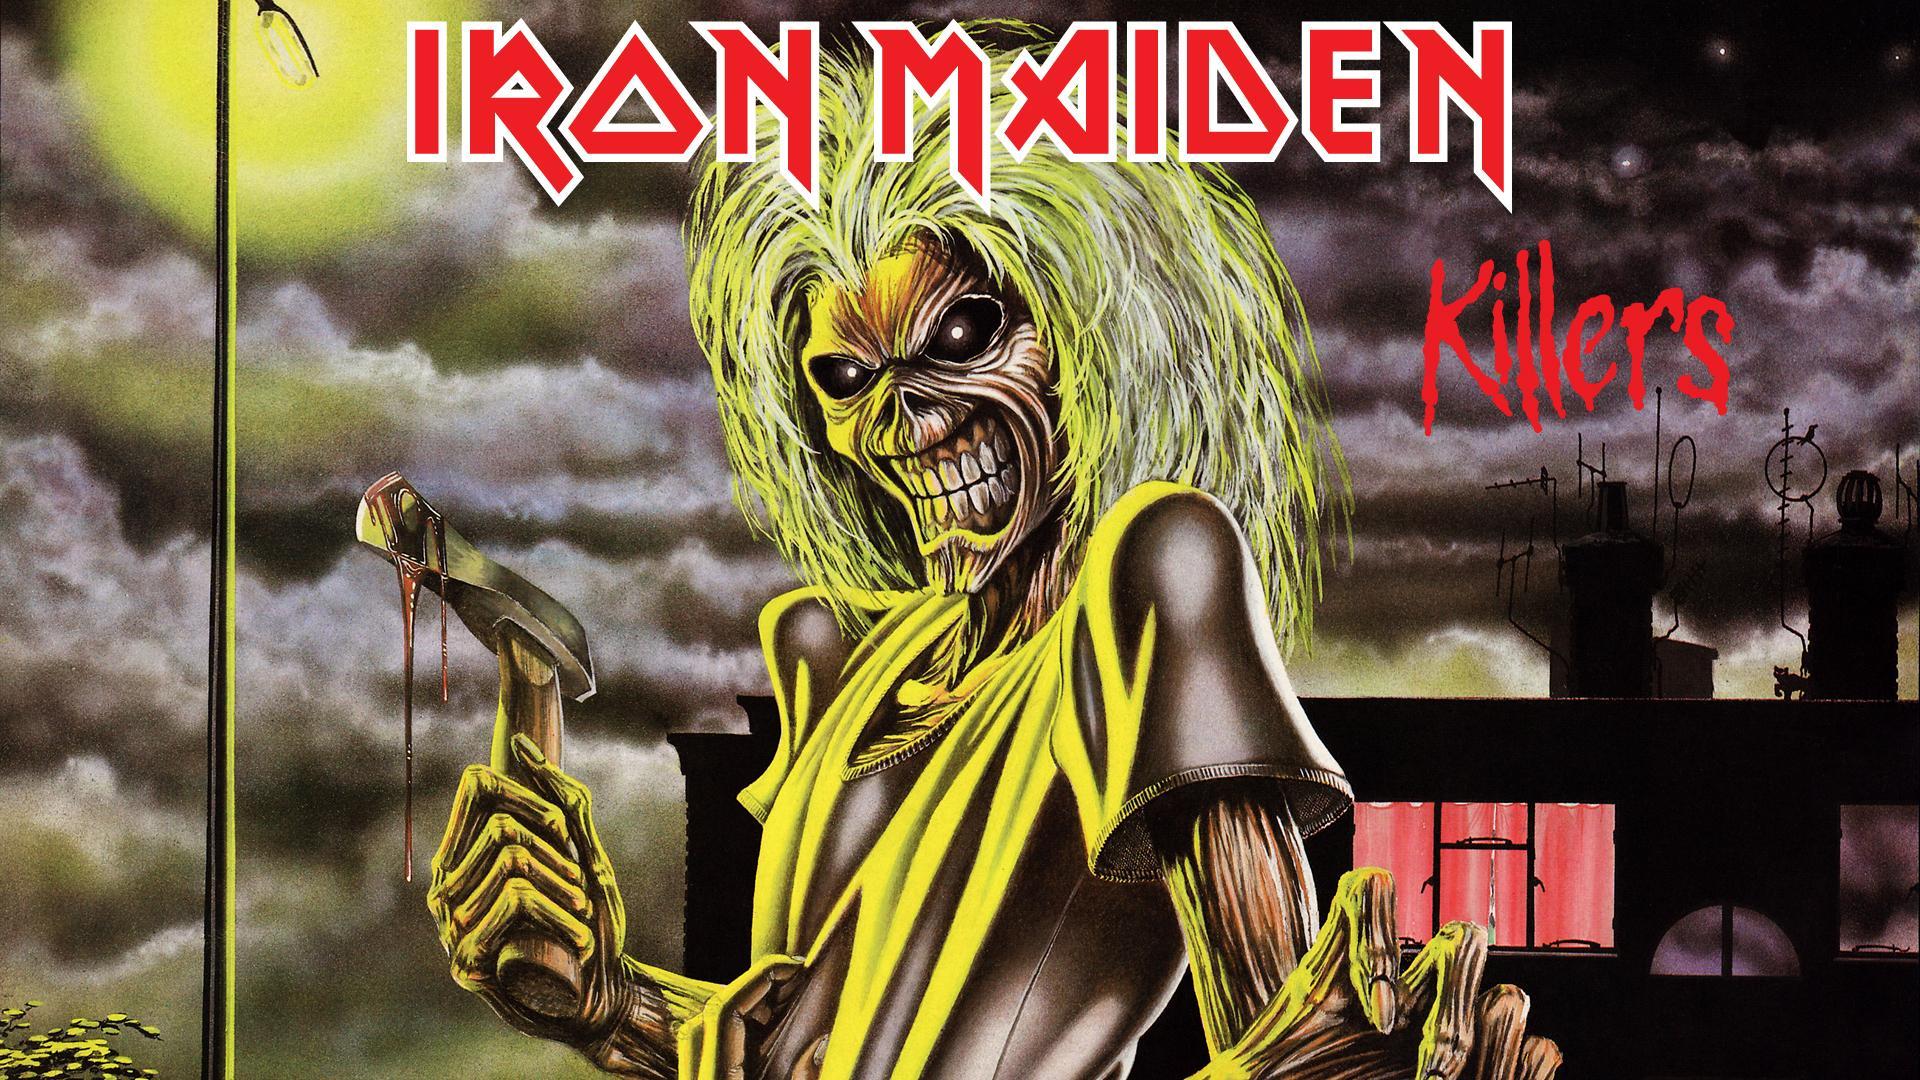 Iron Maiden Computer Wallpapers Desktop Backgrounds 1920x1080 ID